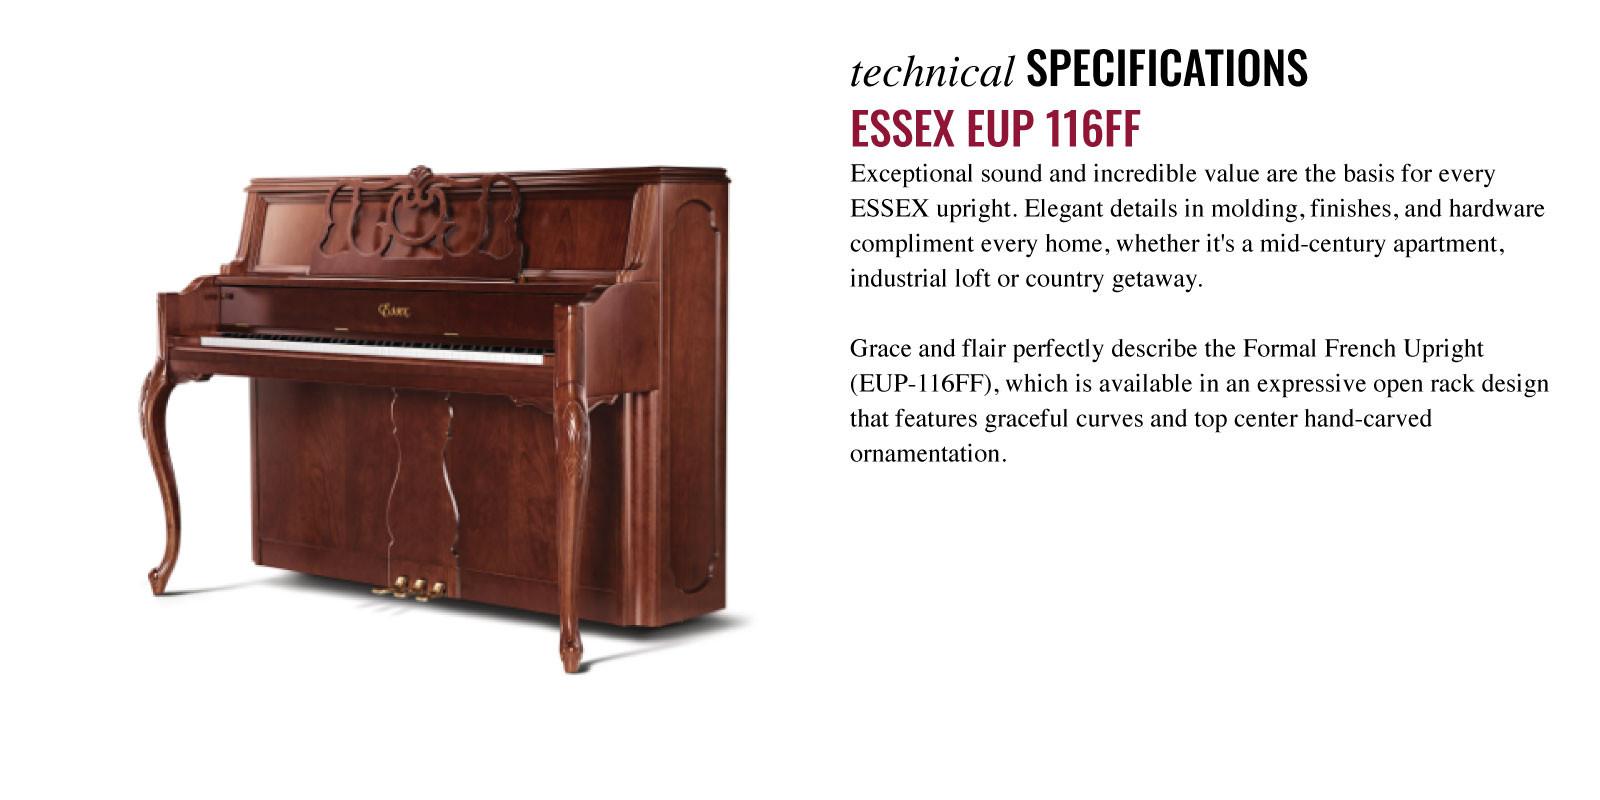 PP-Essex-EUP-116FF-Details-1.jpg